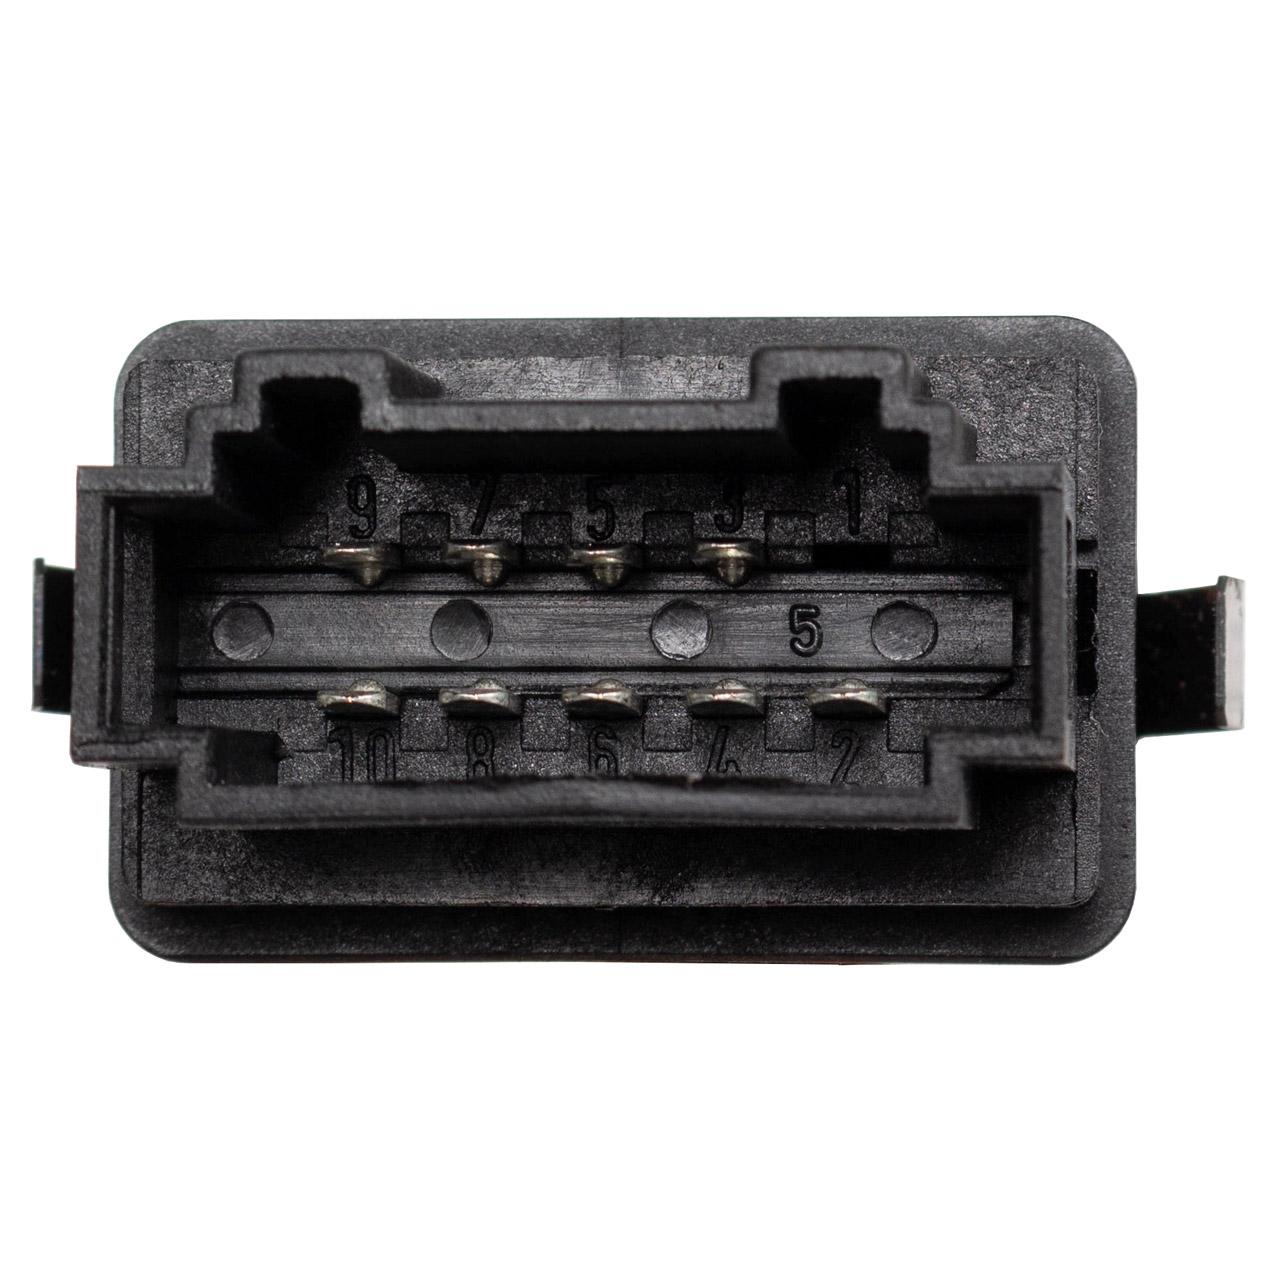 ORIGINAL Audi Warnblinkschalter Warnlichtschalter Warnblinker TT 8N 8N0941509B